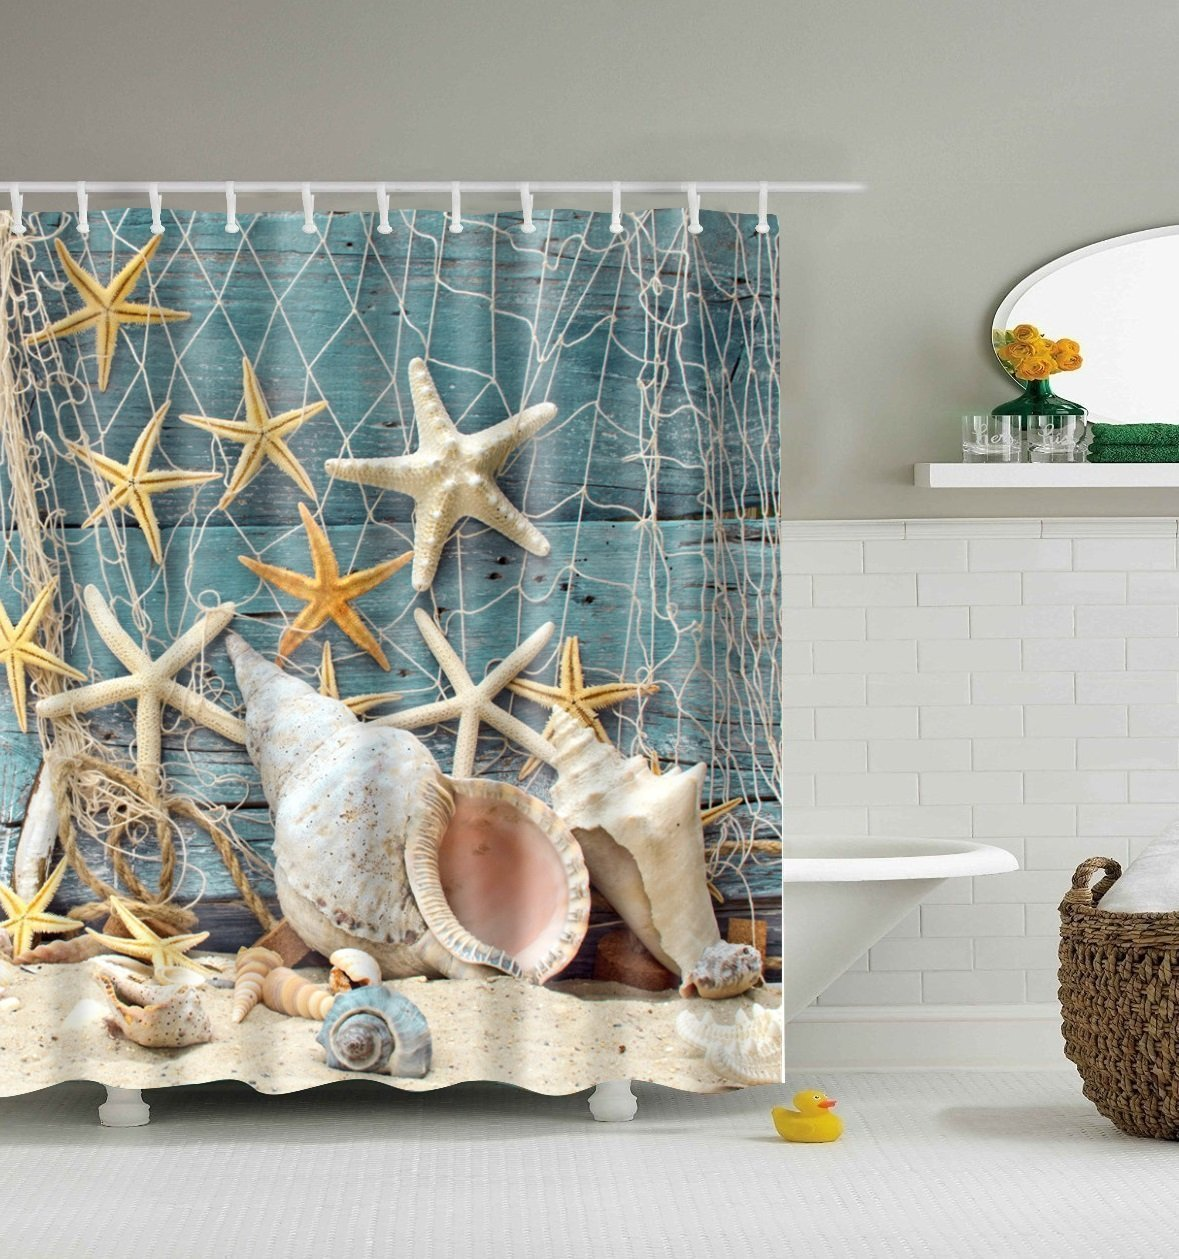 Shower Curtain Set,Starfish Seashell Bathroom Beach Ocean Decor Style Bath Linen 100%Waterproof Mildew Resistant PEVA 72W X 72H AmuKer